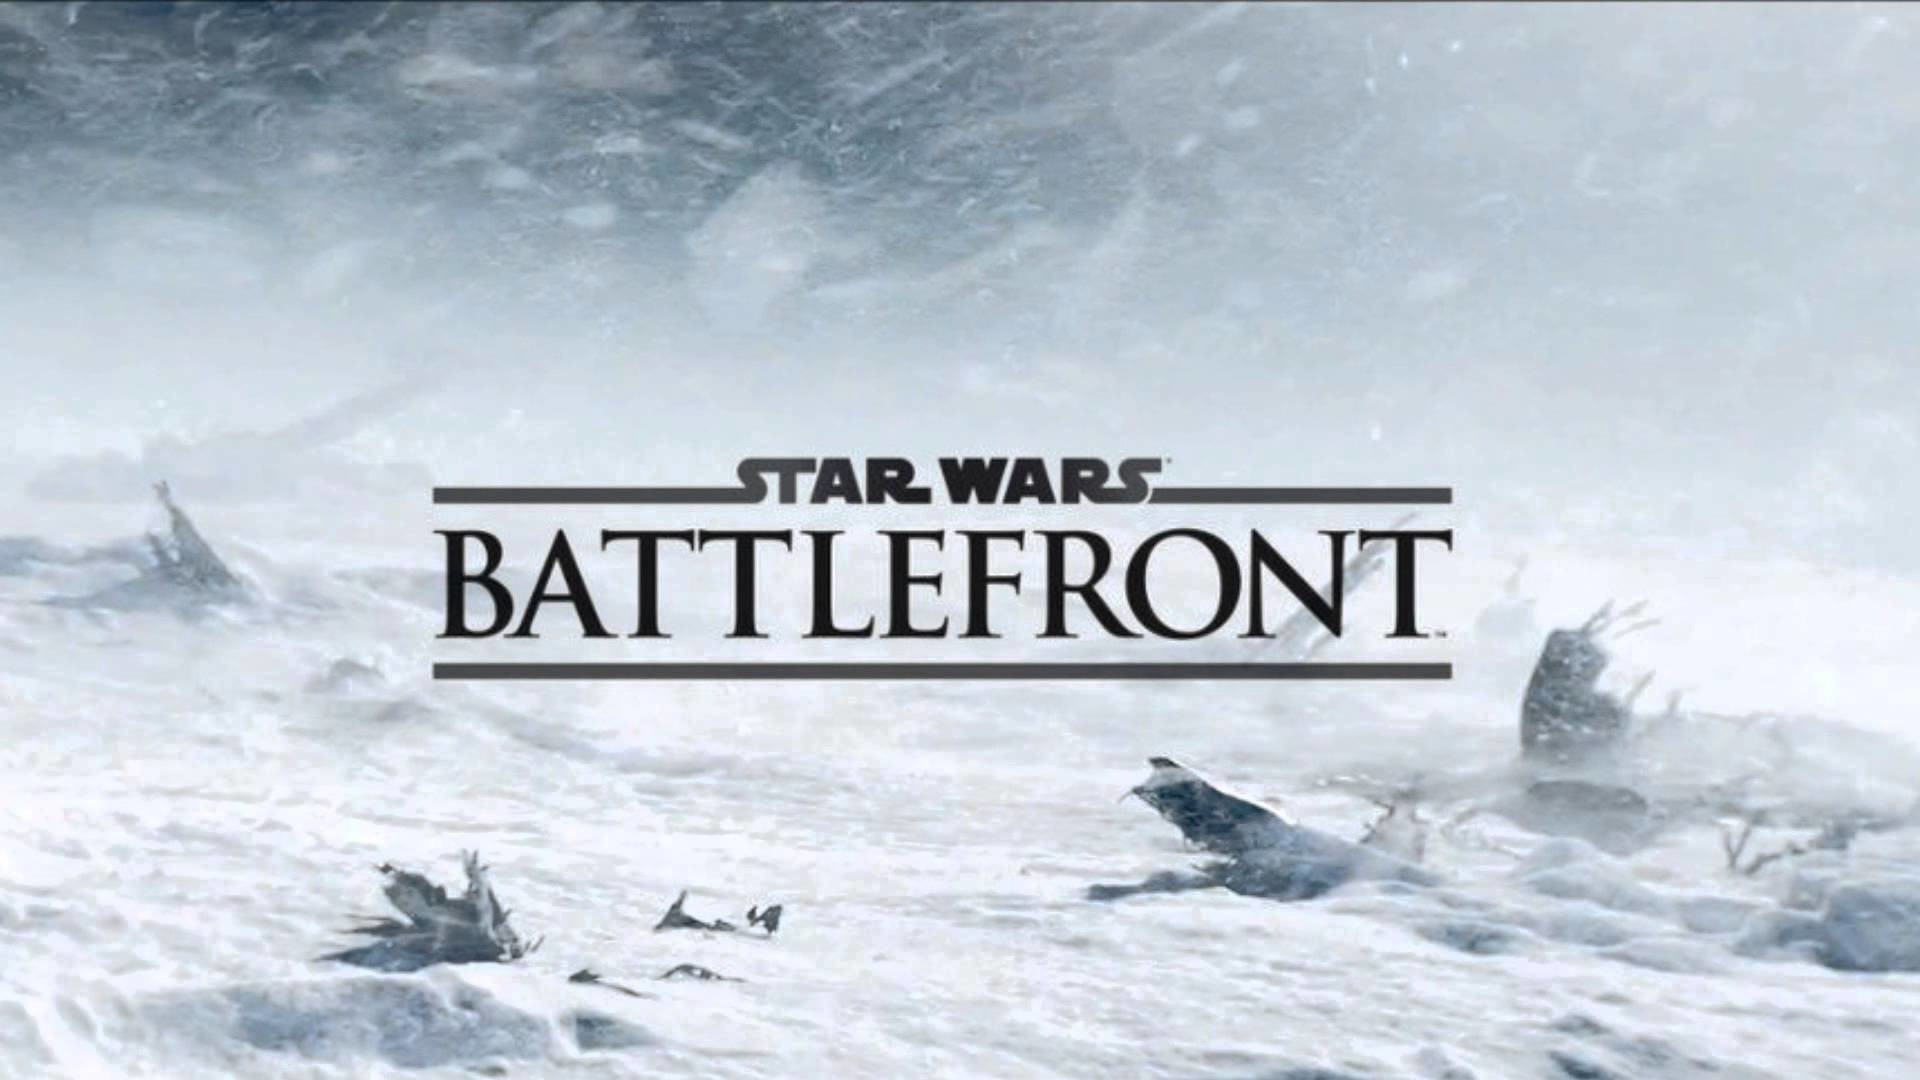 Star Wars Battlefront Gets New Smartphone Wallpapers; Downloadable Images  Inside   The Games Cabin